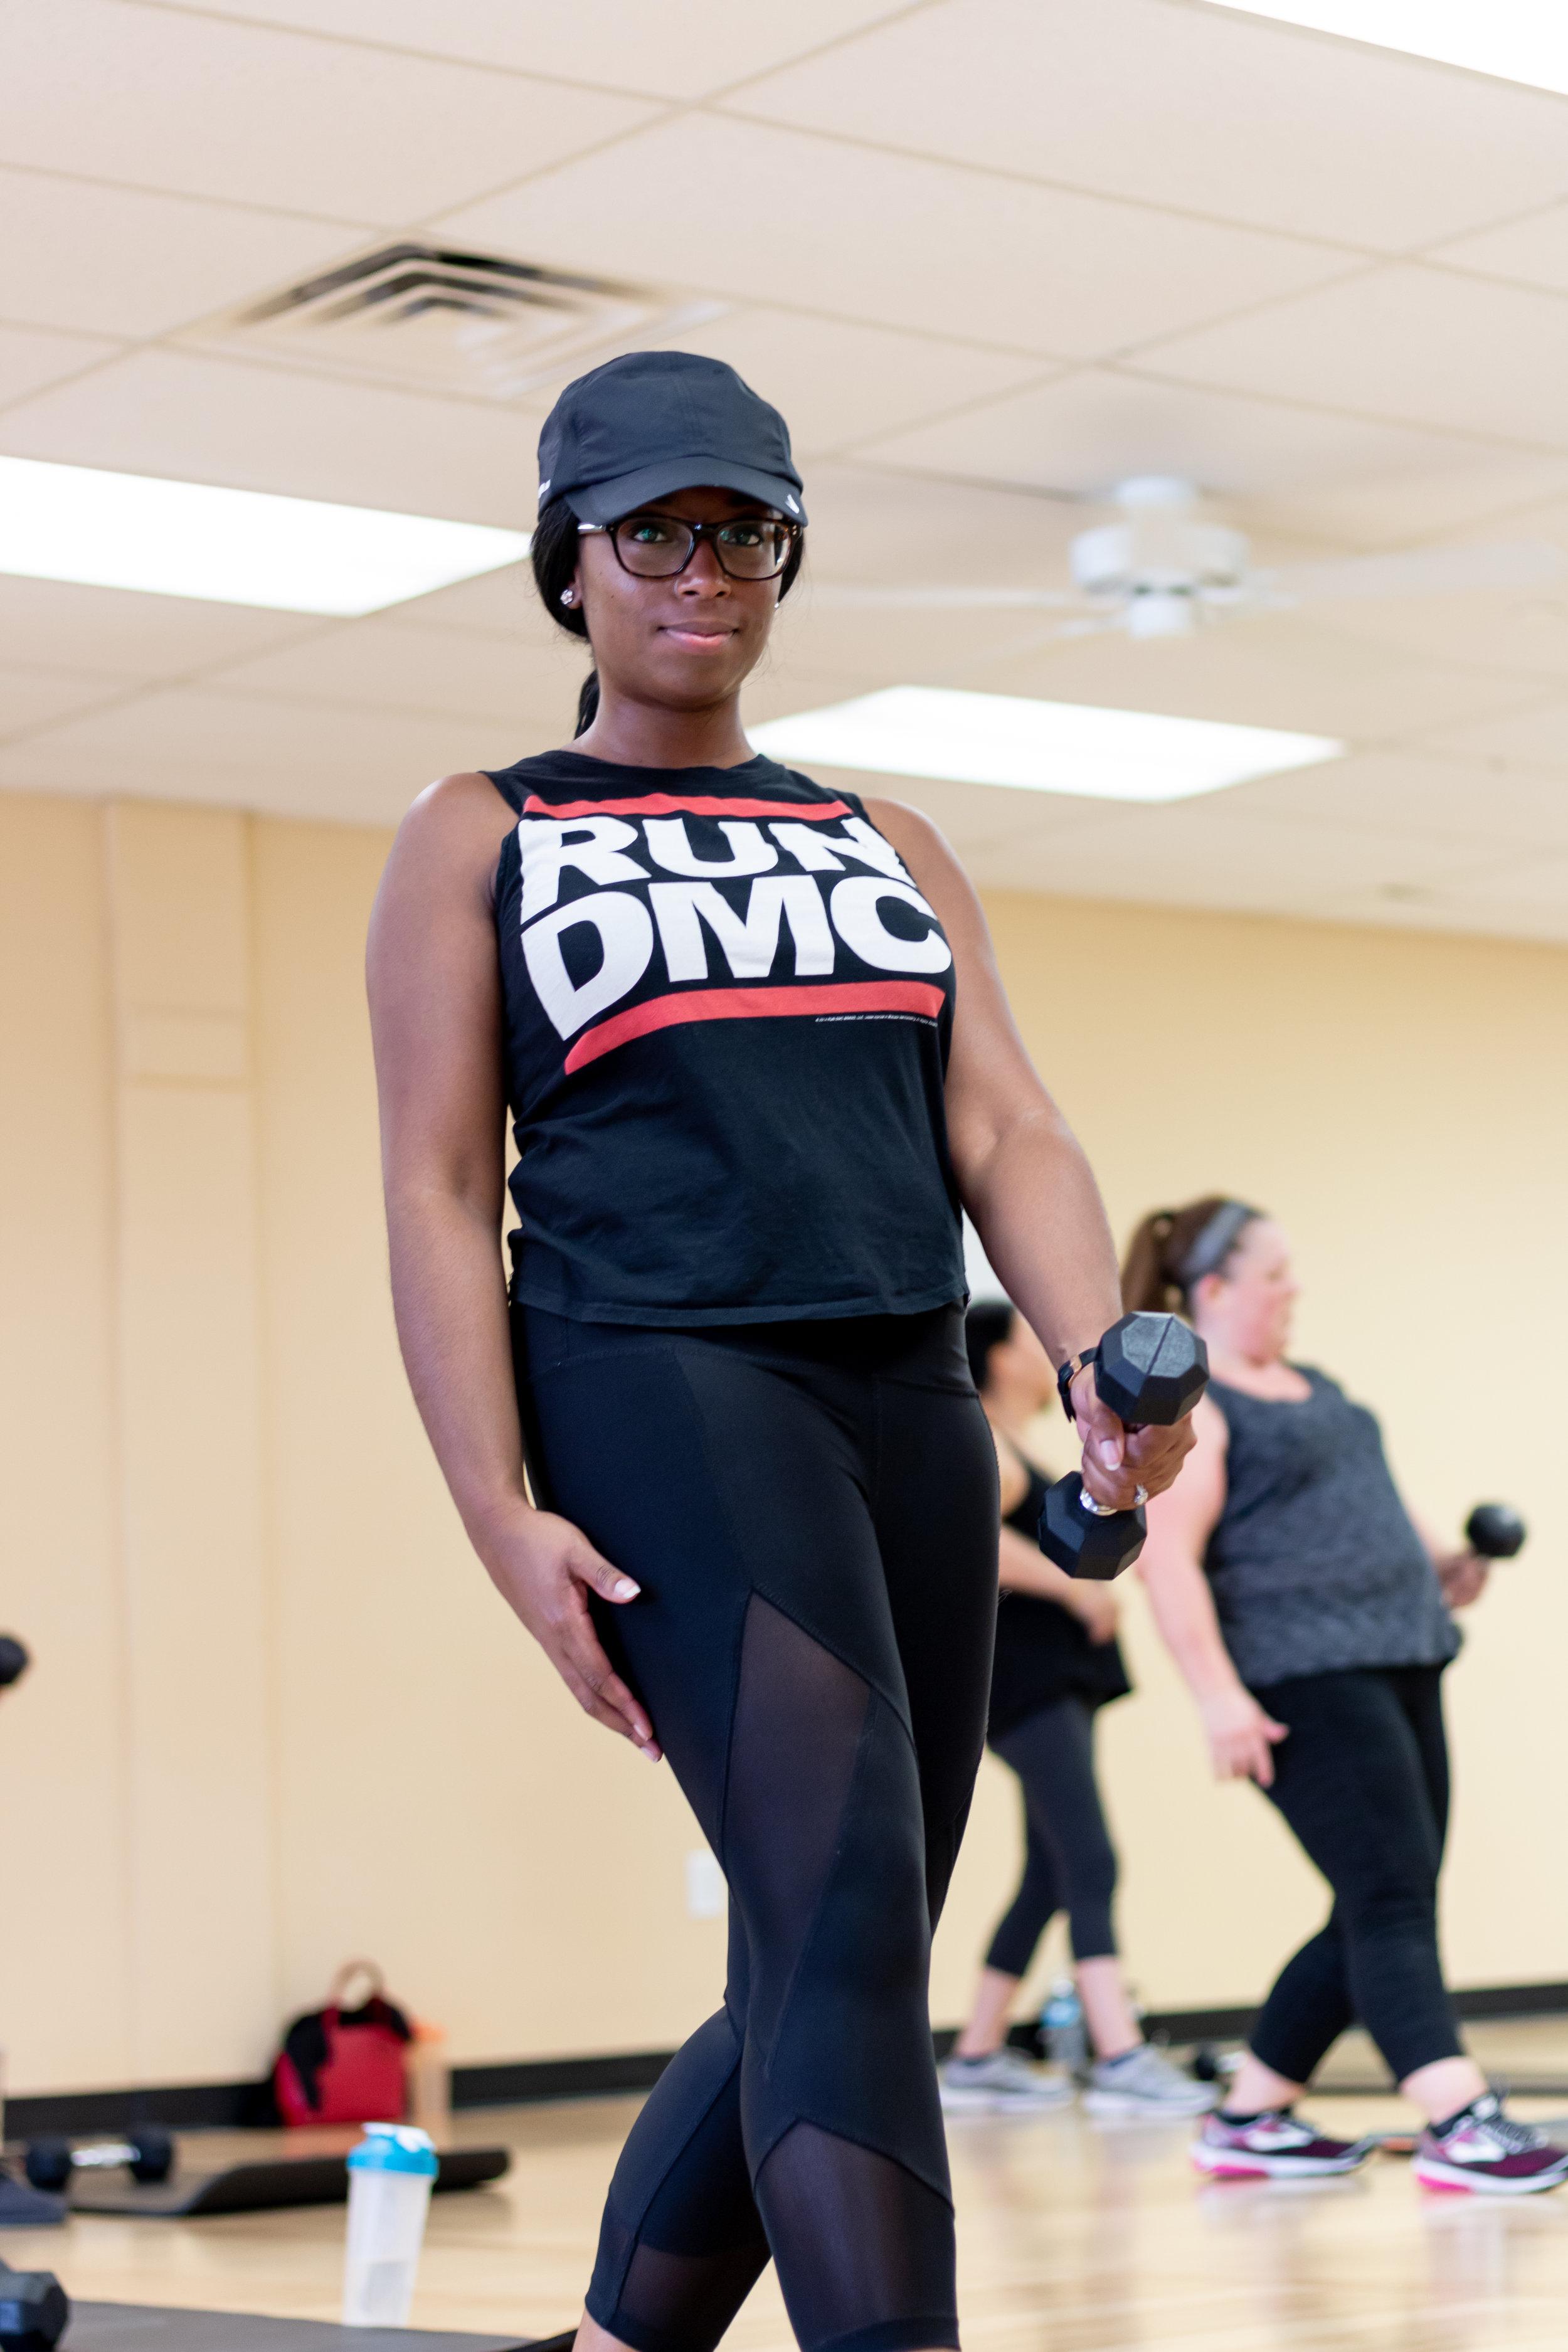 jazzercise-weight-training-cardio-class-fitness